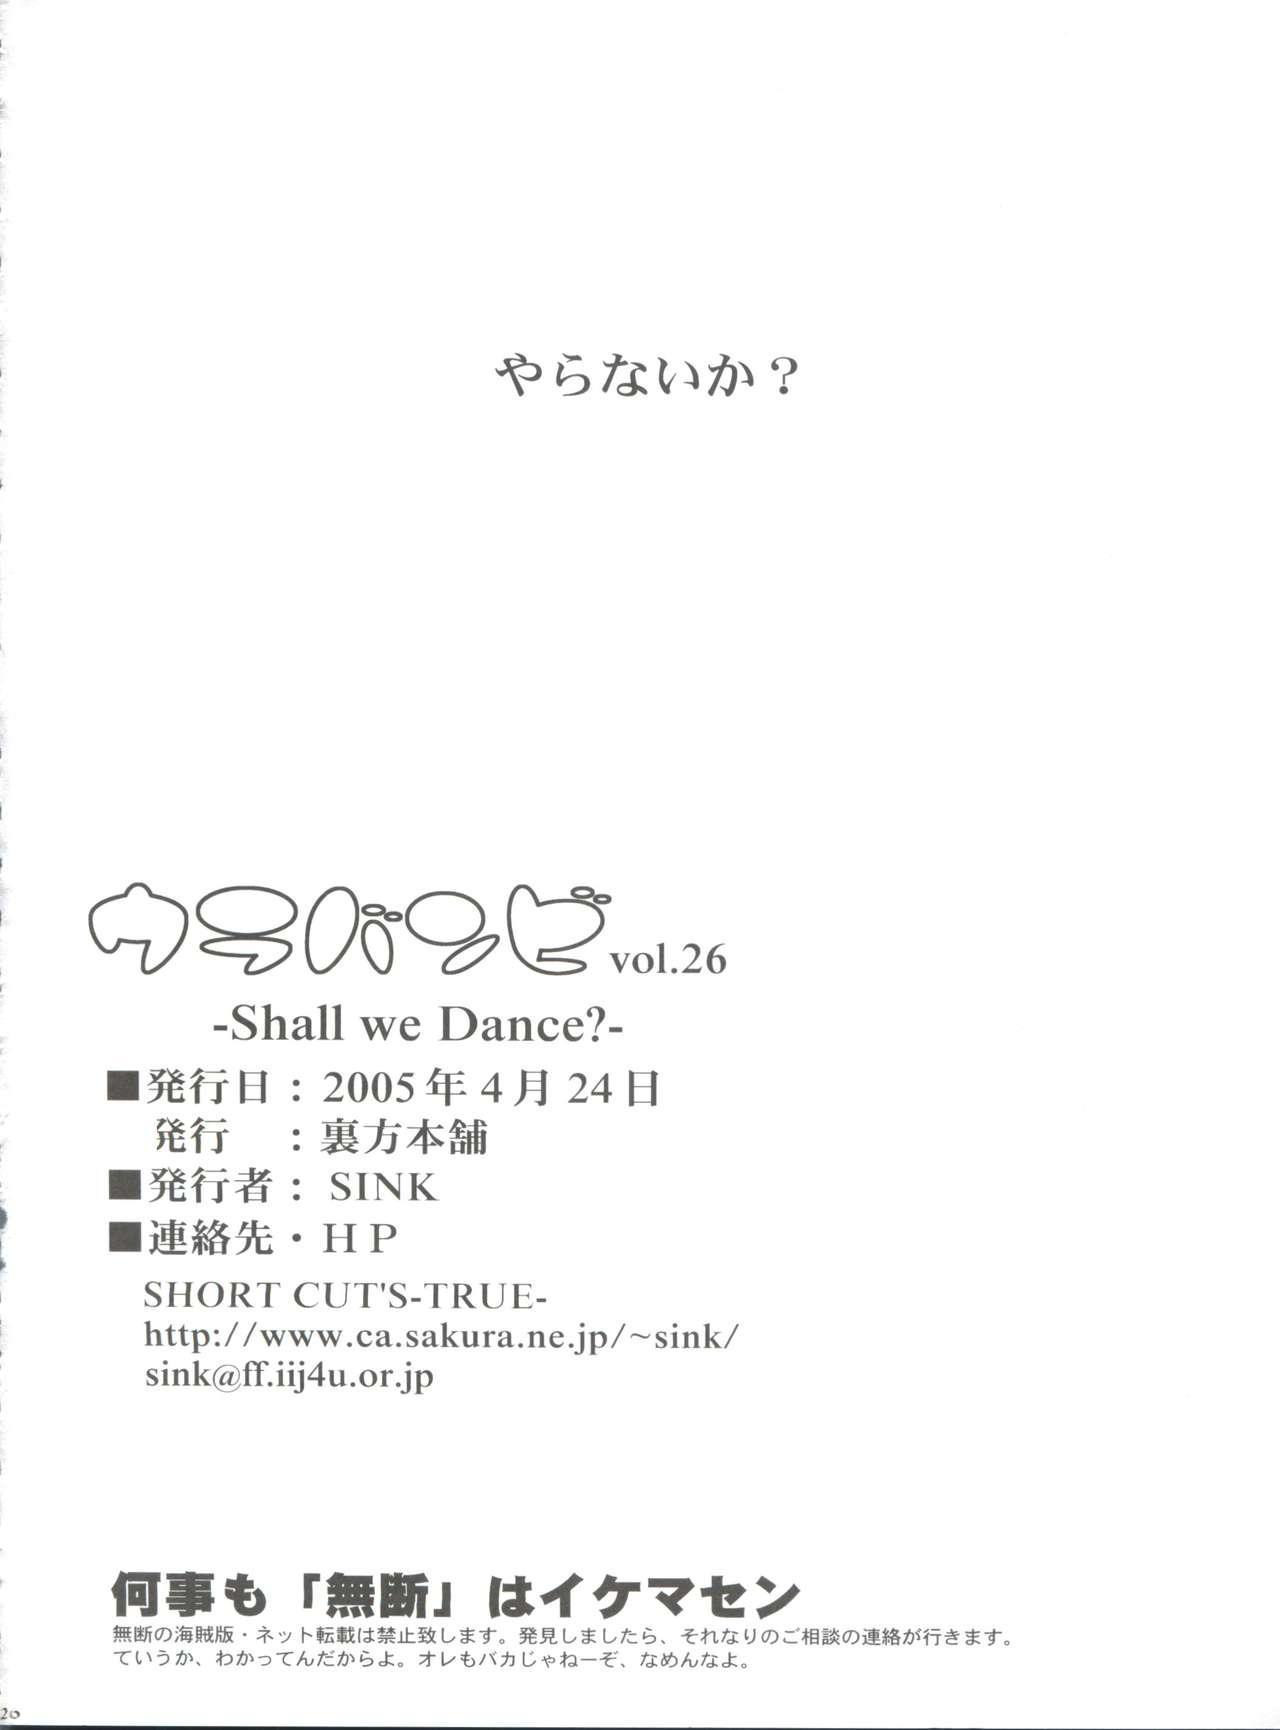 Urabambi Vol. 26 24